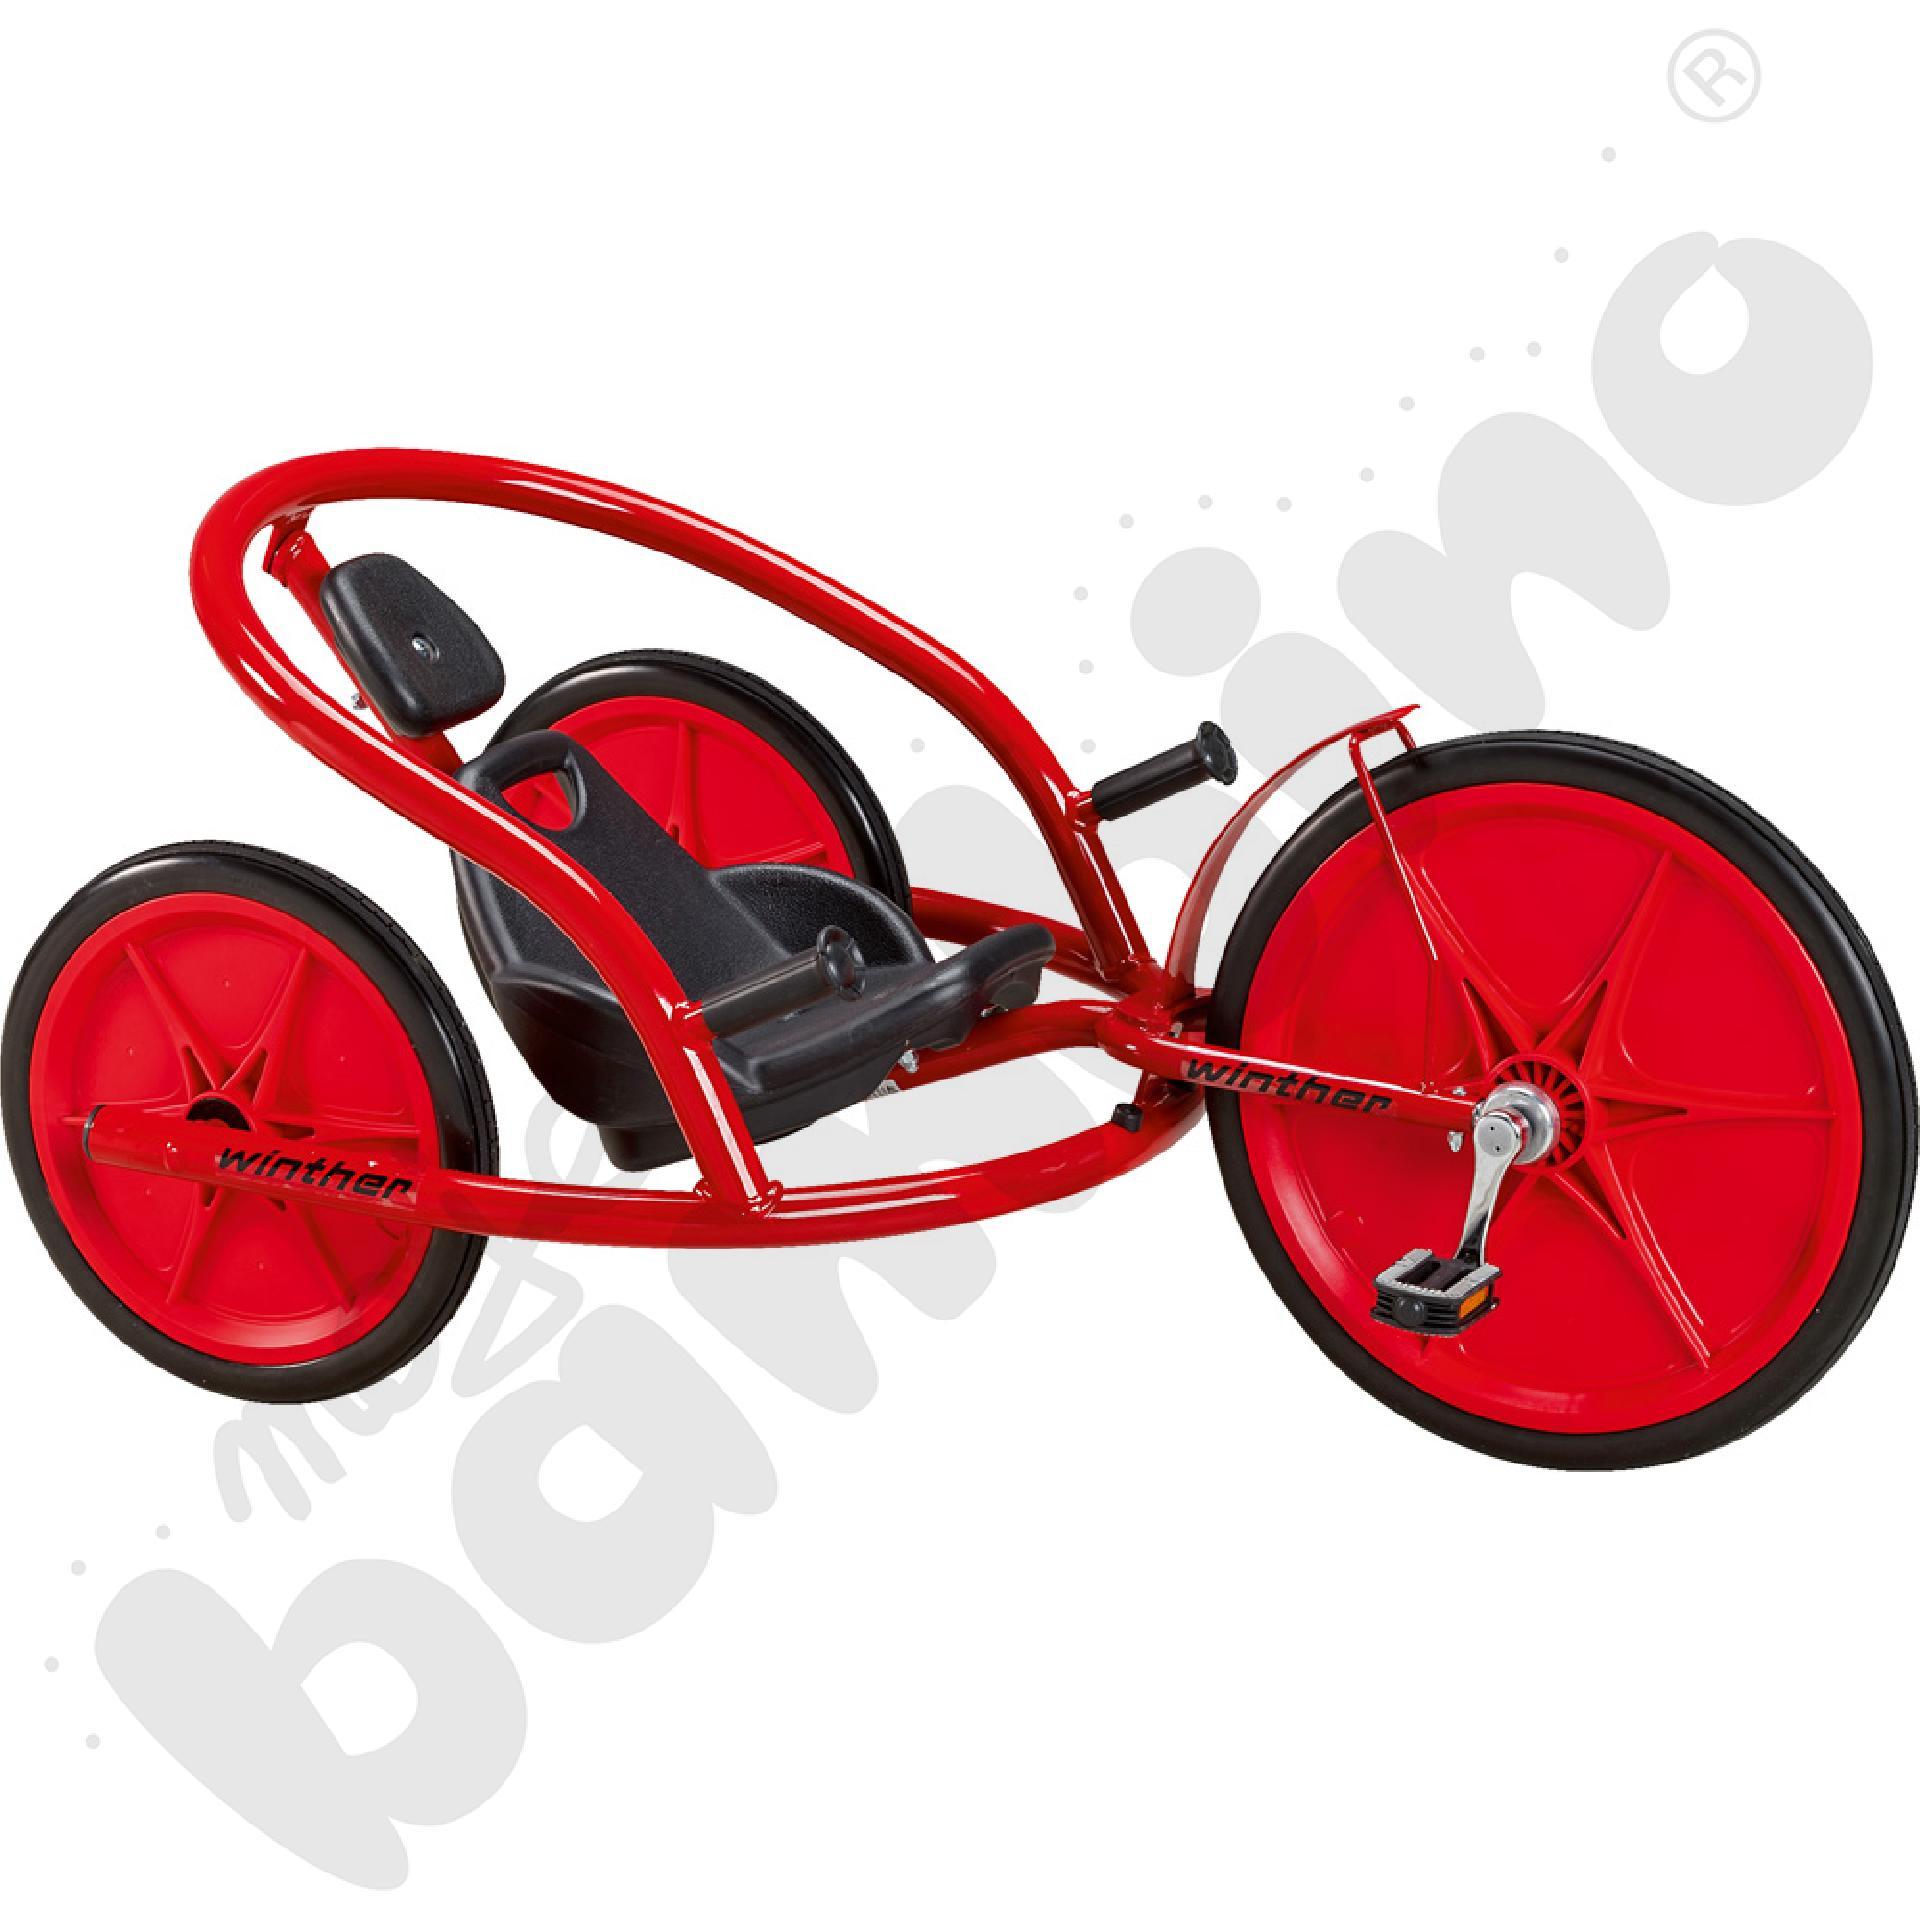 Viking U-Rider - rowerek poziomy